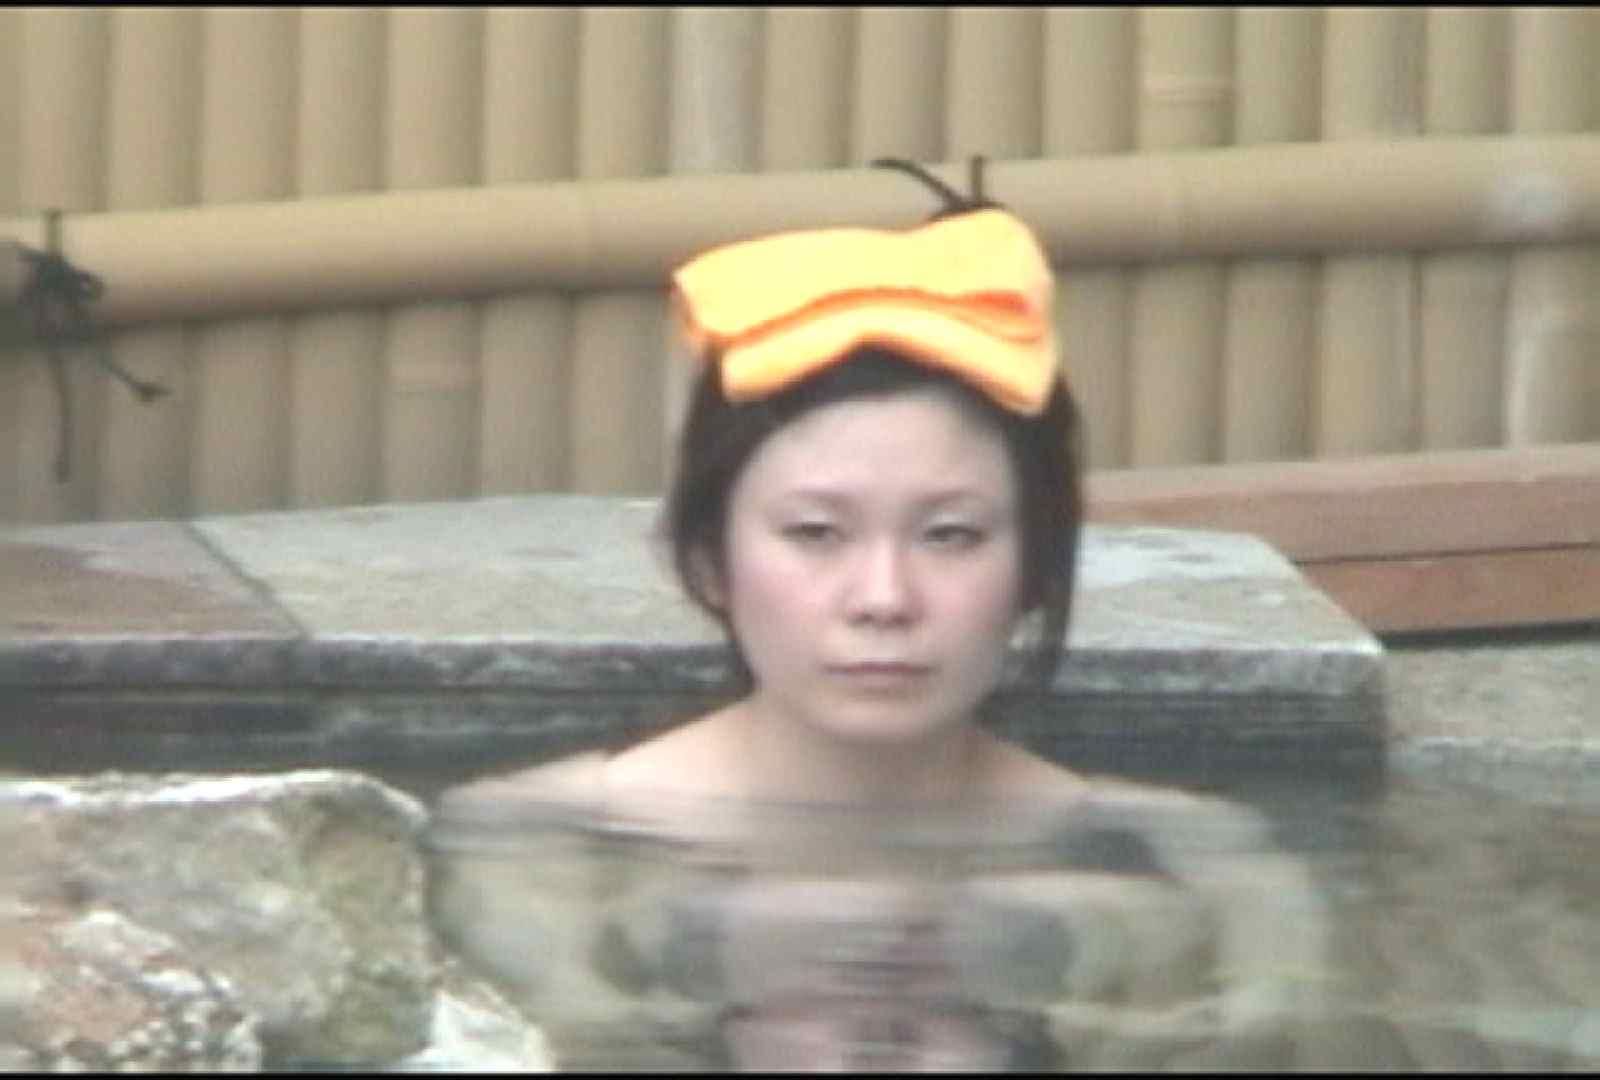 Aquaな露天風呂Vol.177 綺麗なOLたち アダルト動画キャプチャ 112枚 74